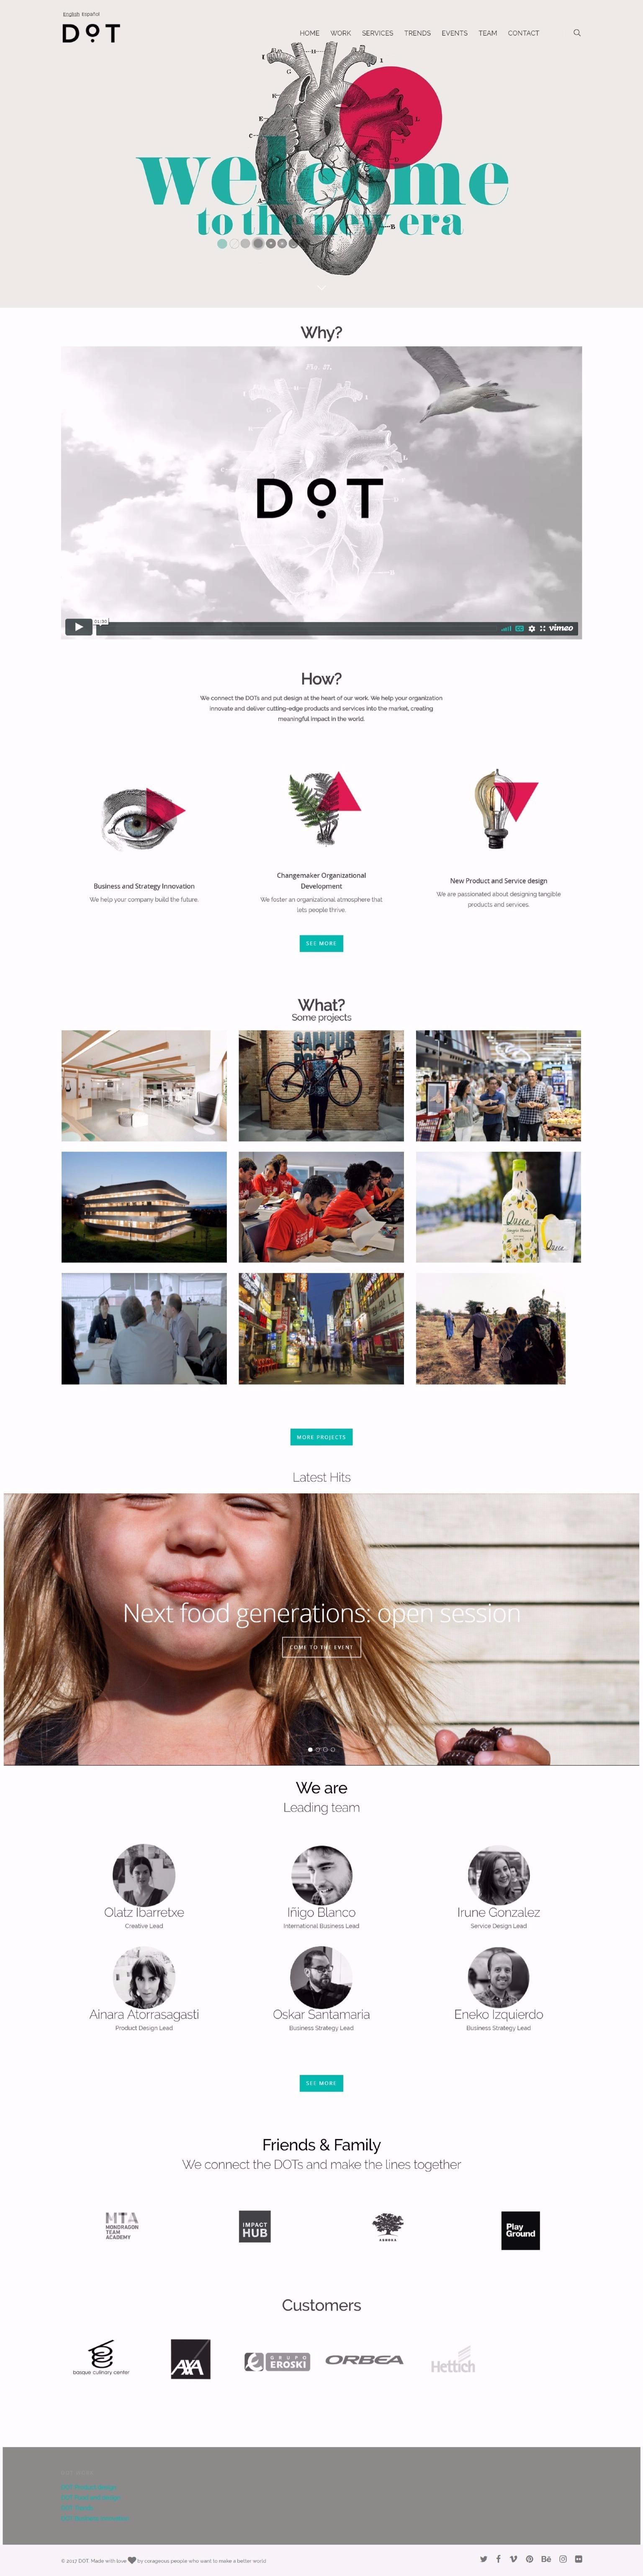 Detalle diseño web corporativa DOT